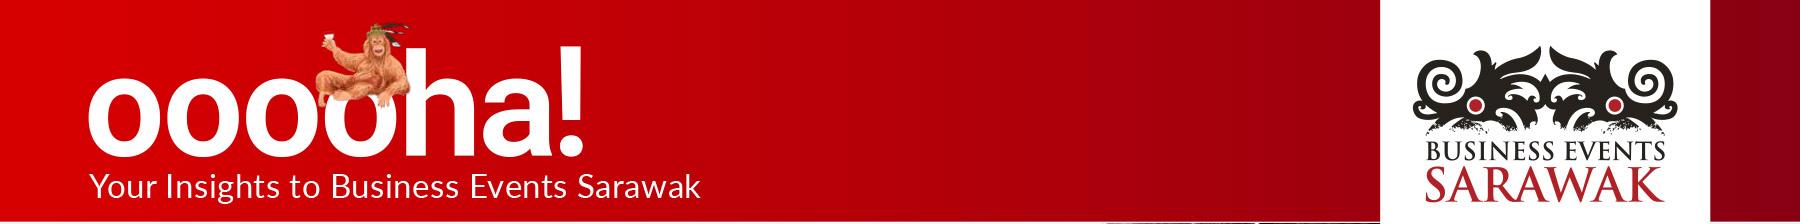 BESarawak Industry Related News – August 2021